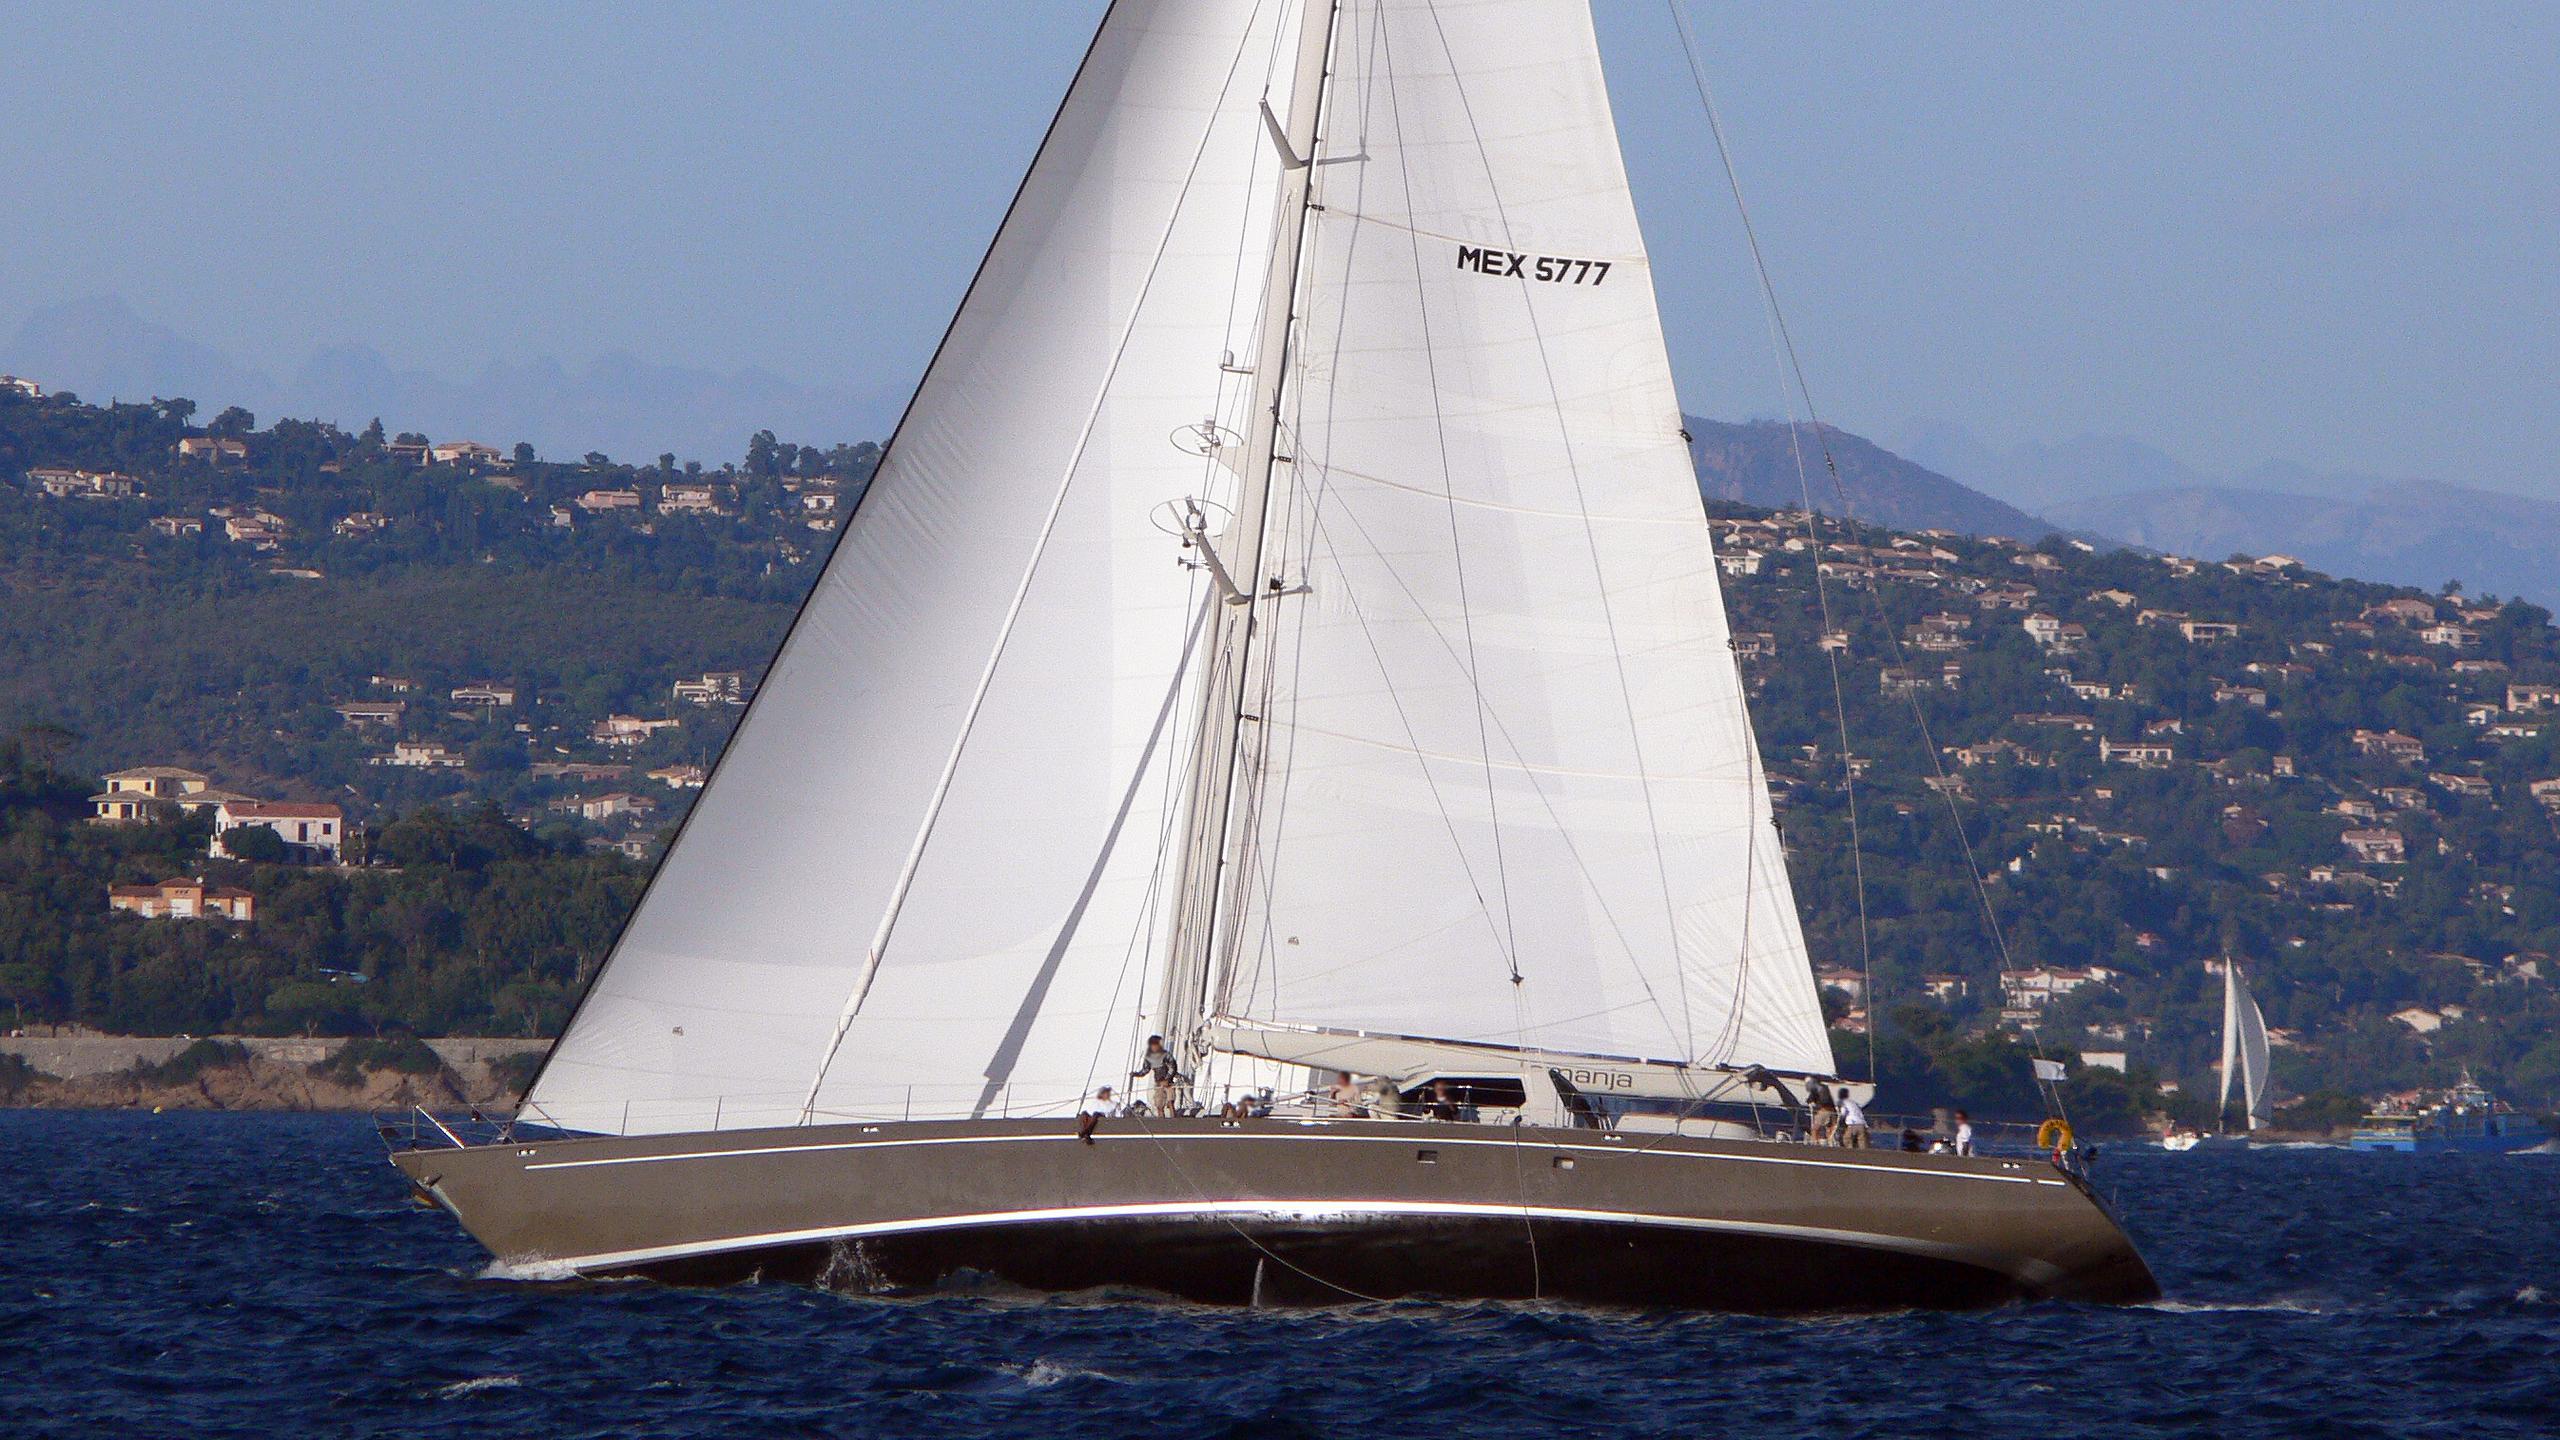 iemanja-v-sailing-yacht-biot-1988-32m-cruising-profile